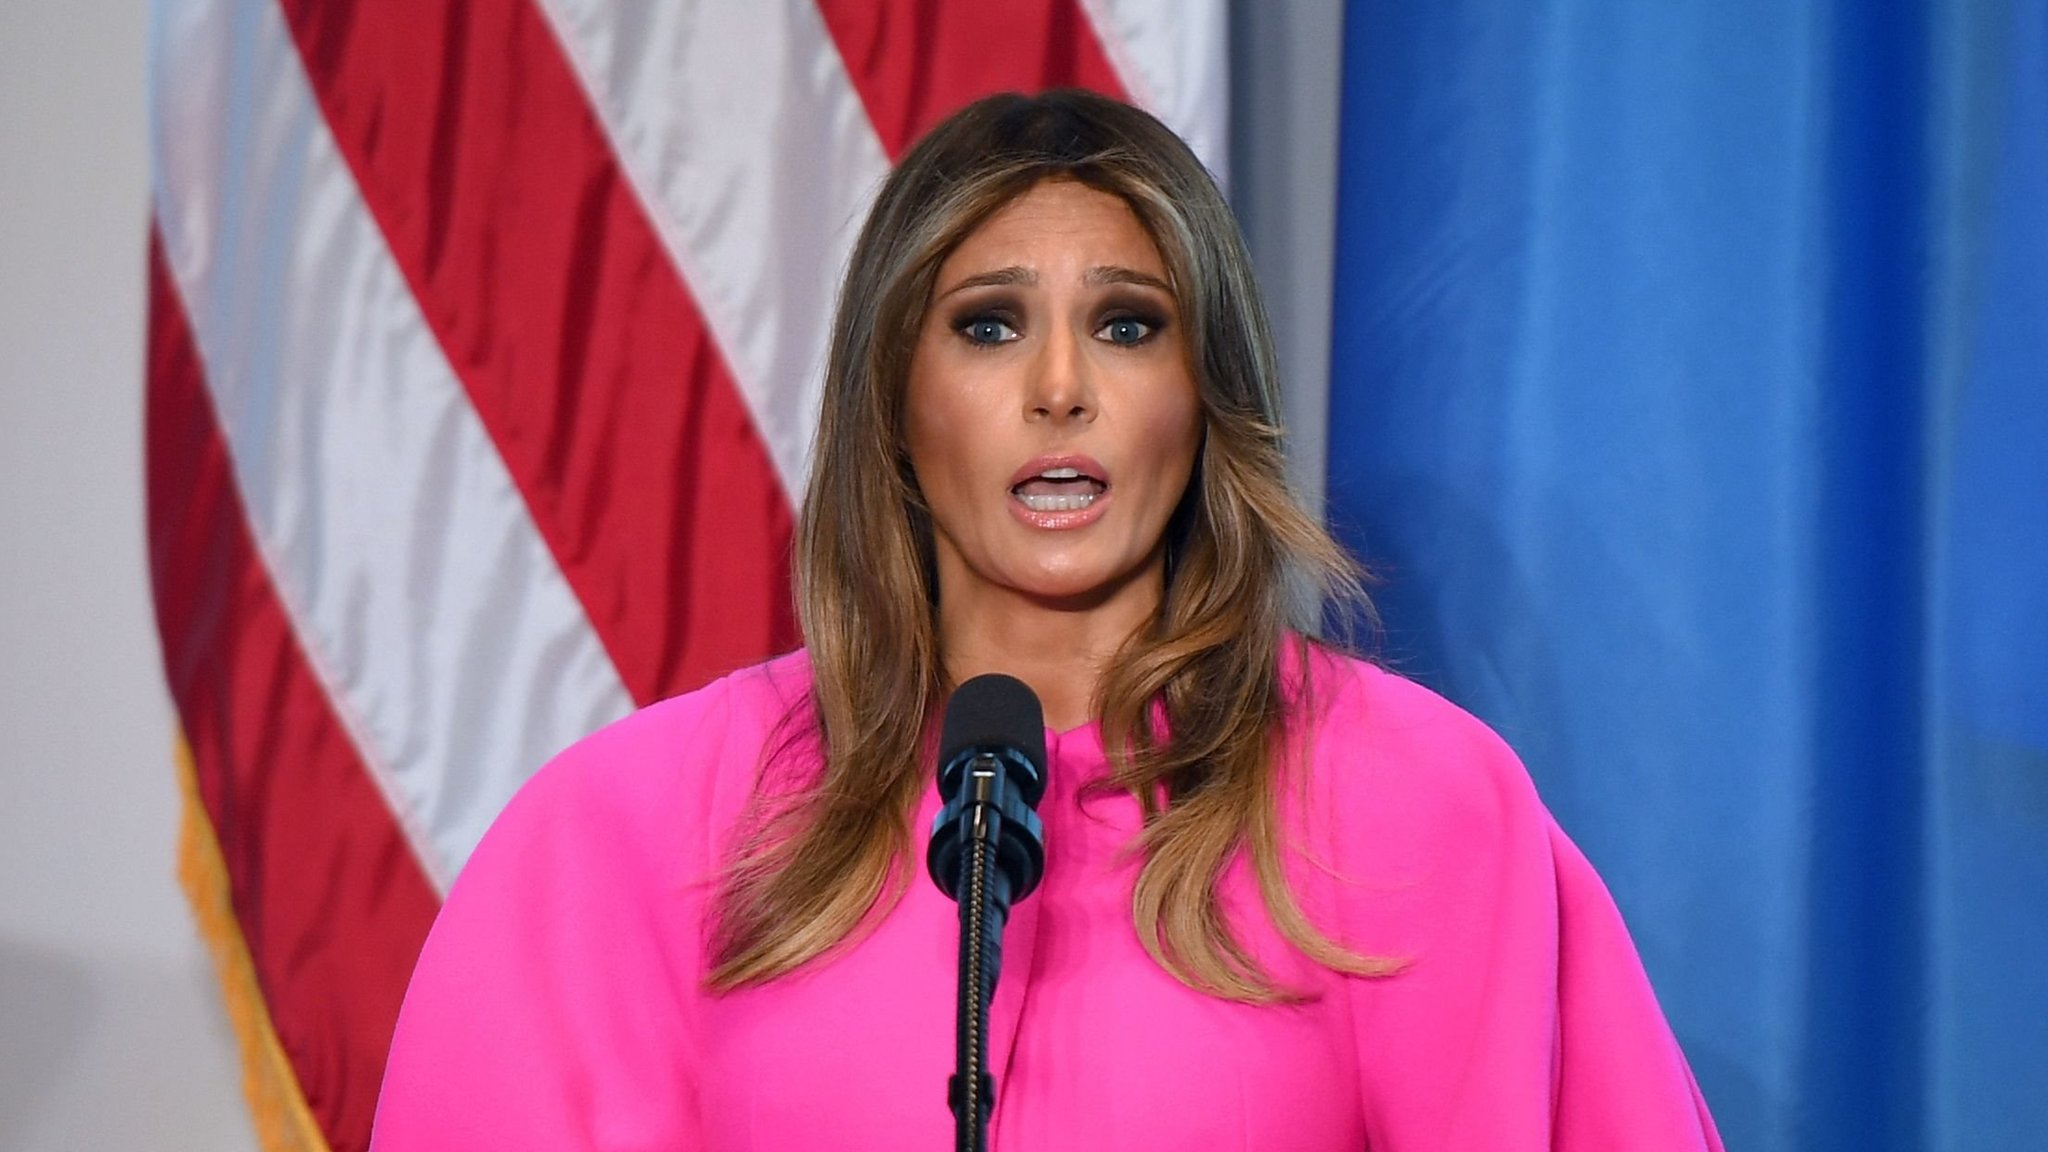 Меланию Трамп критикуют после речи о кибер-буллинге